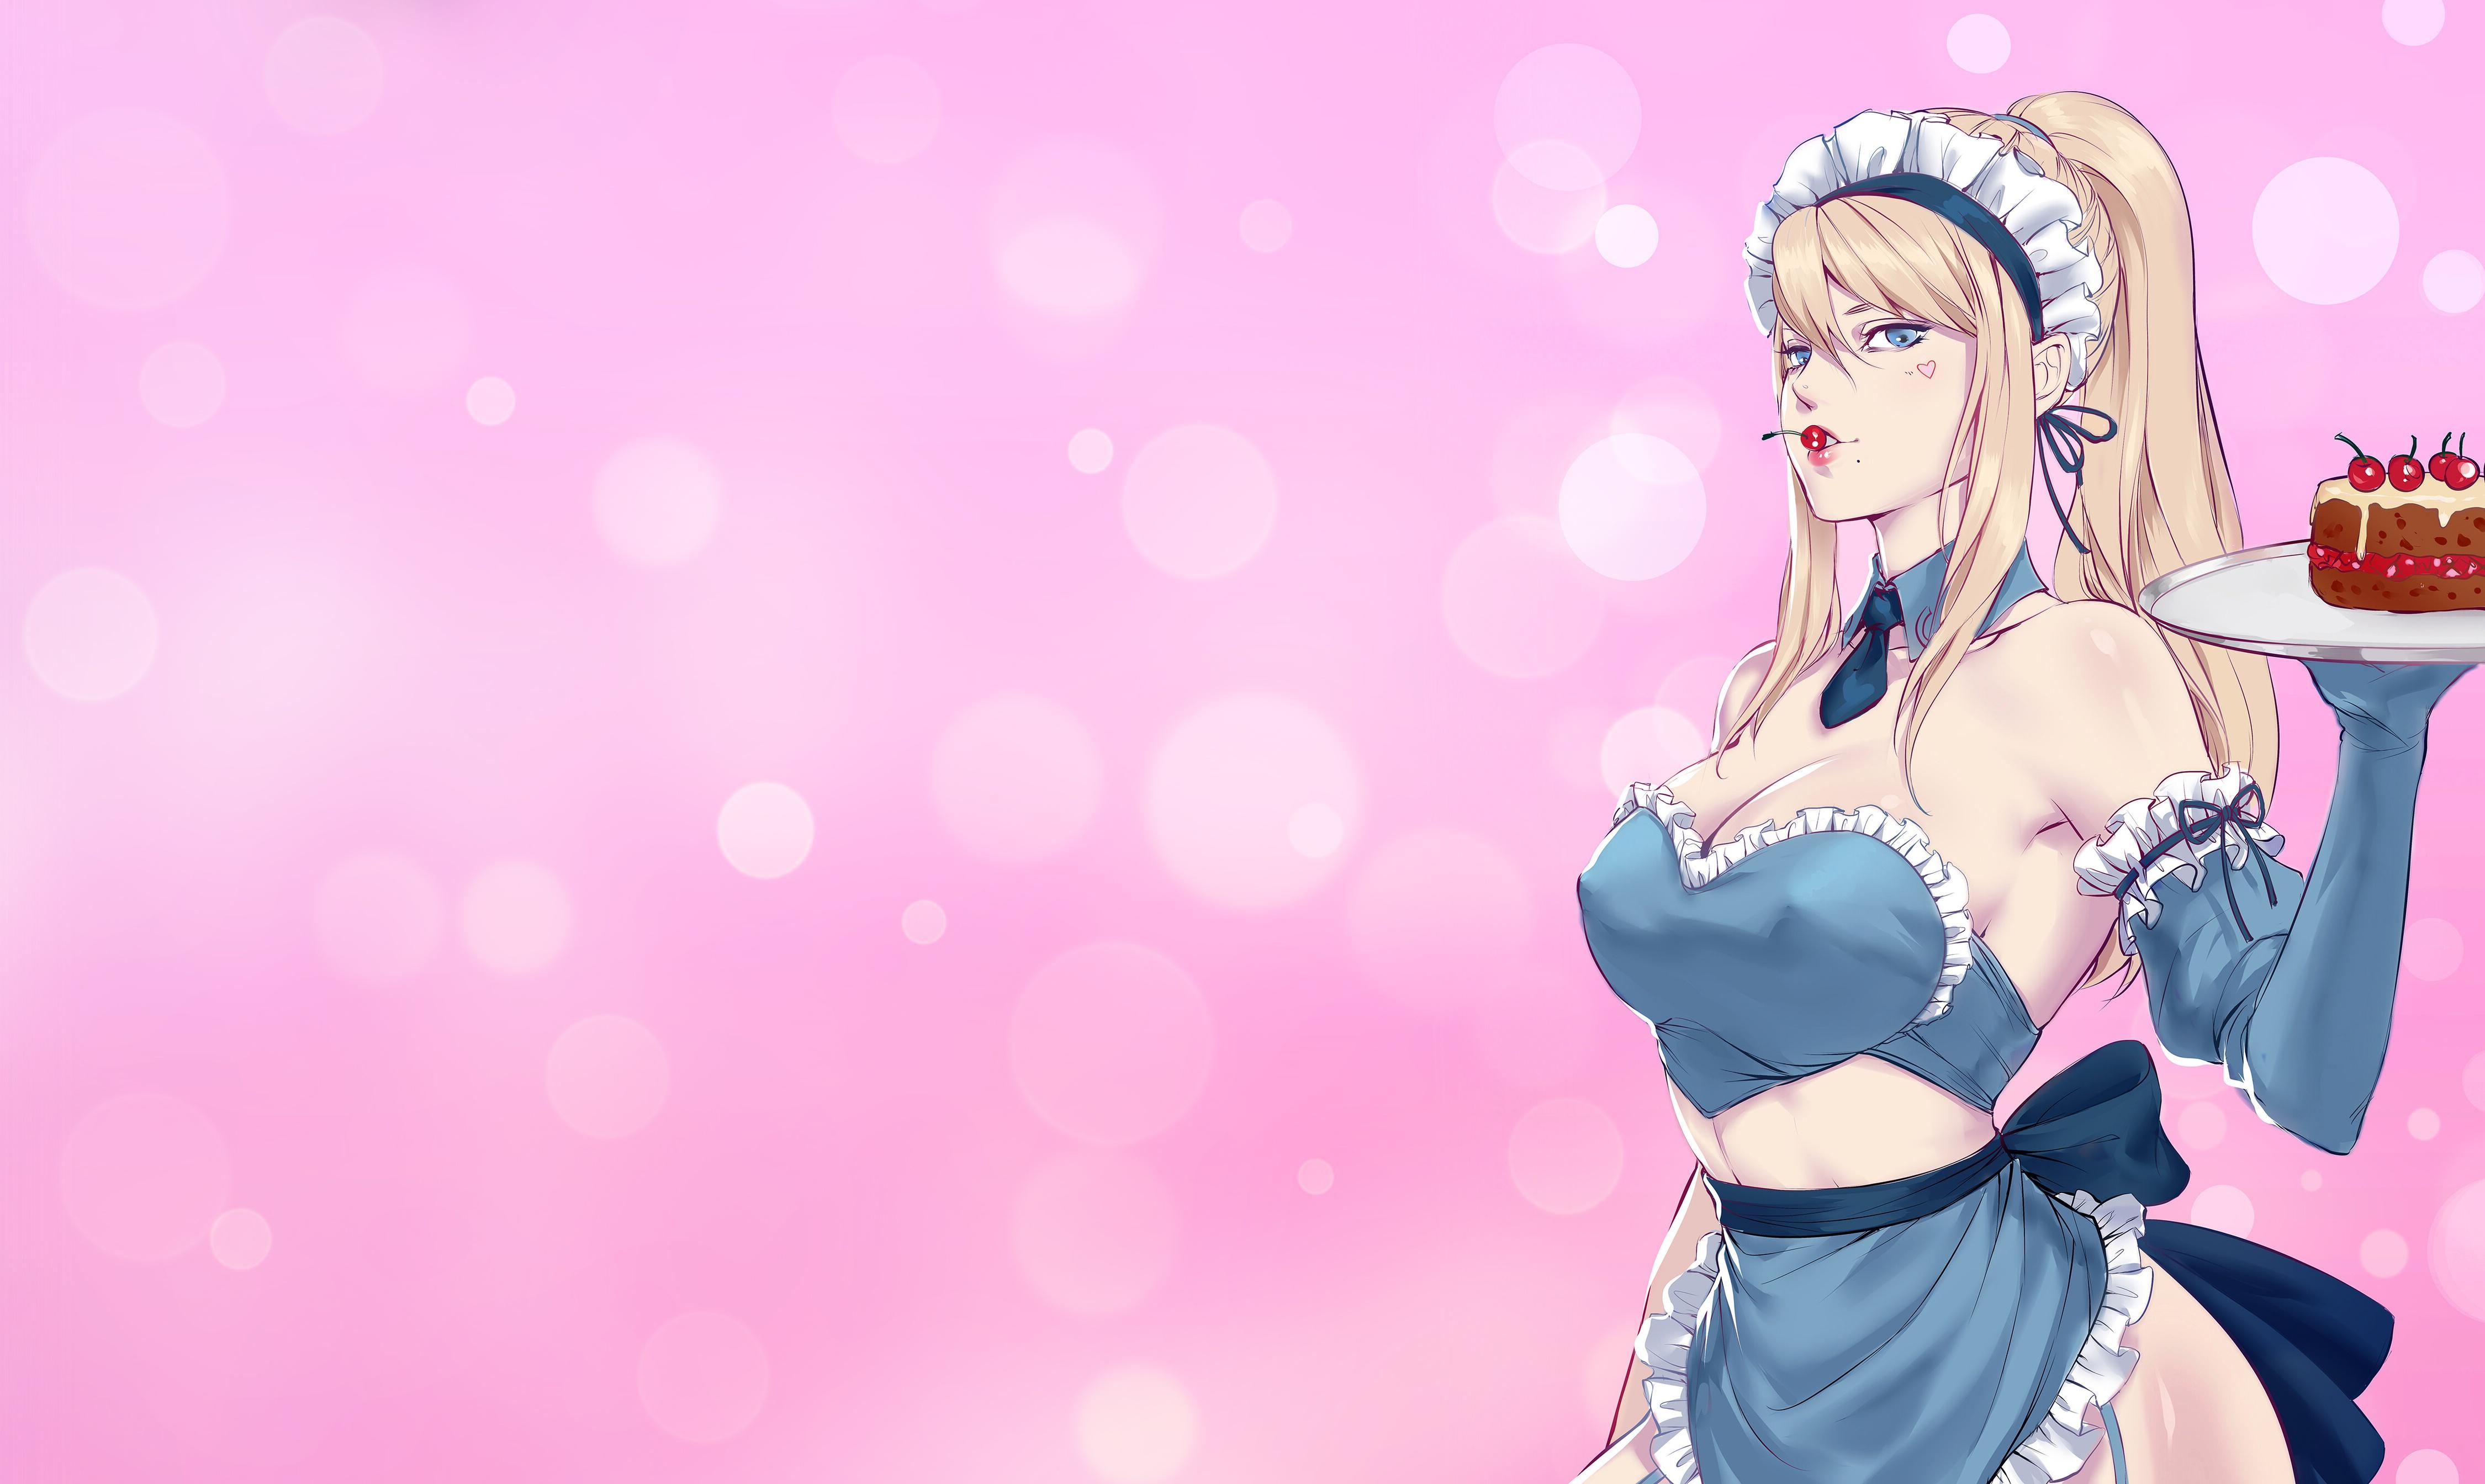 Anime 4500x2688 big boobs blonde anime girls anime cake cherries blue eyes pink background